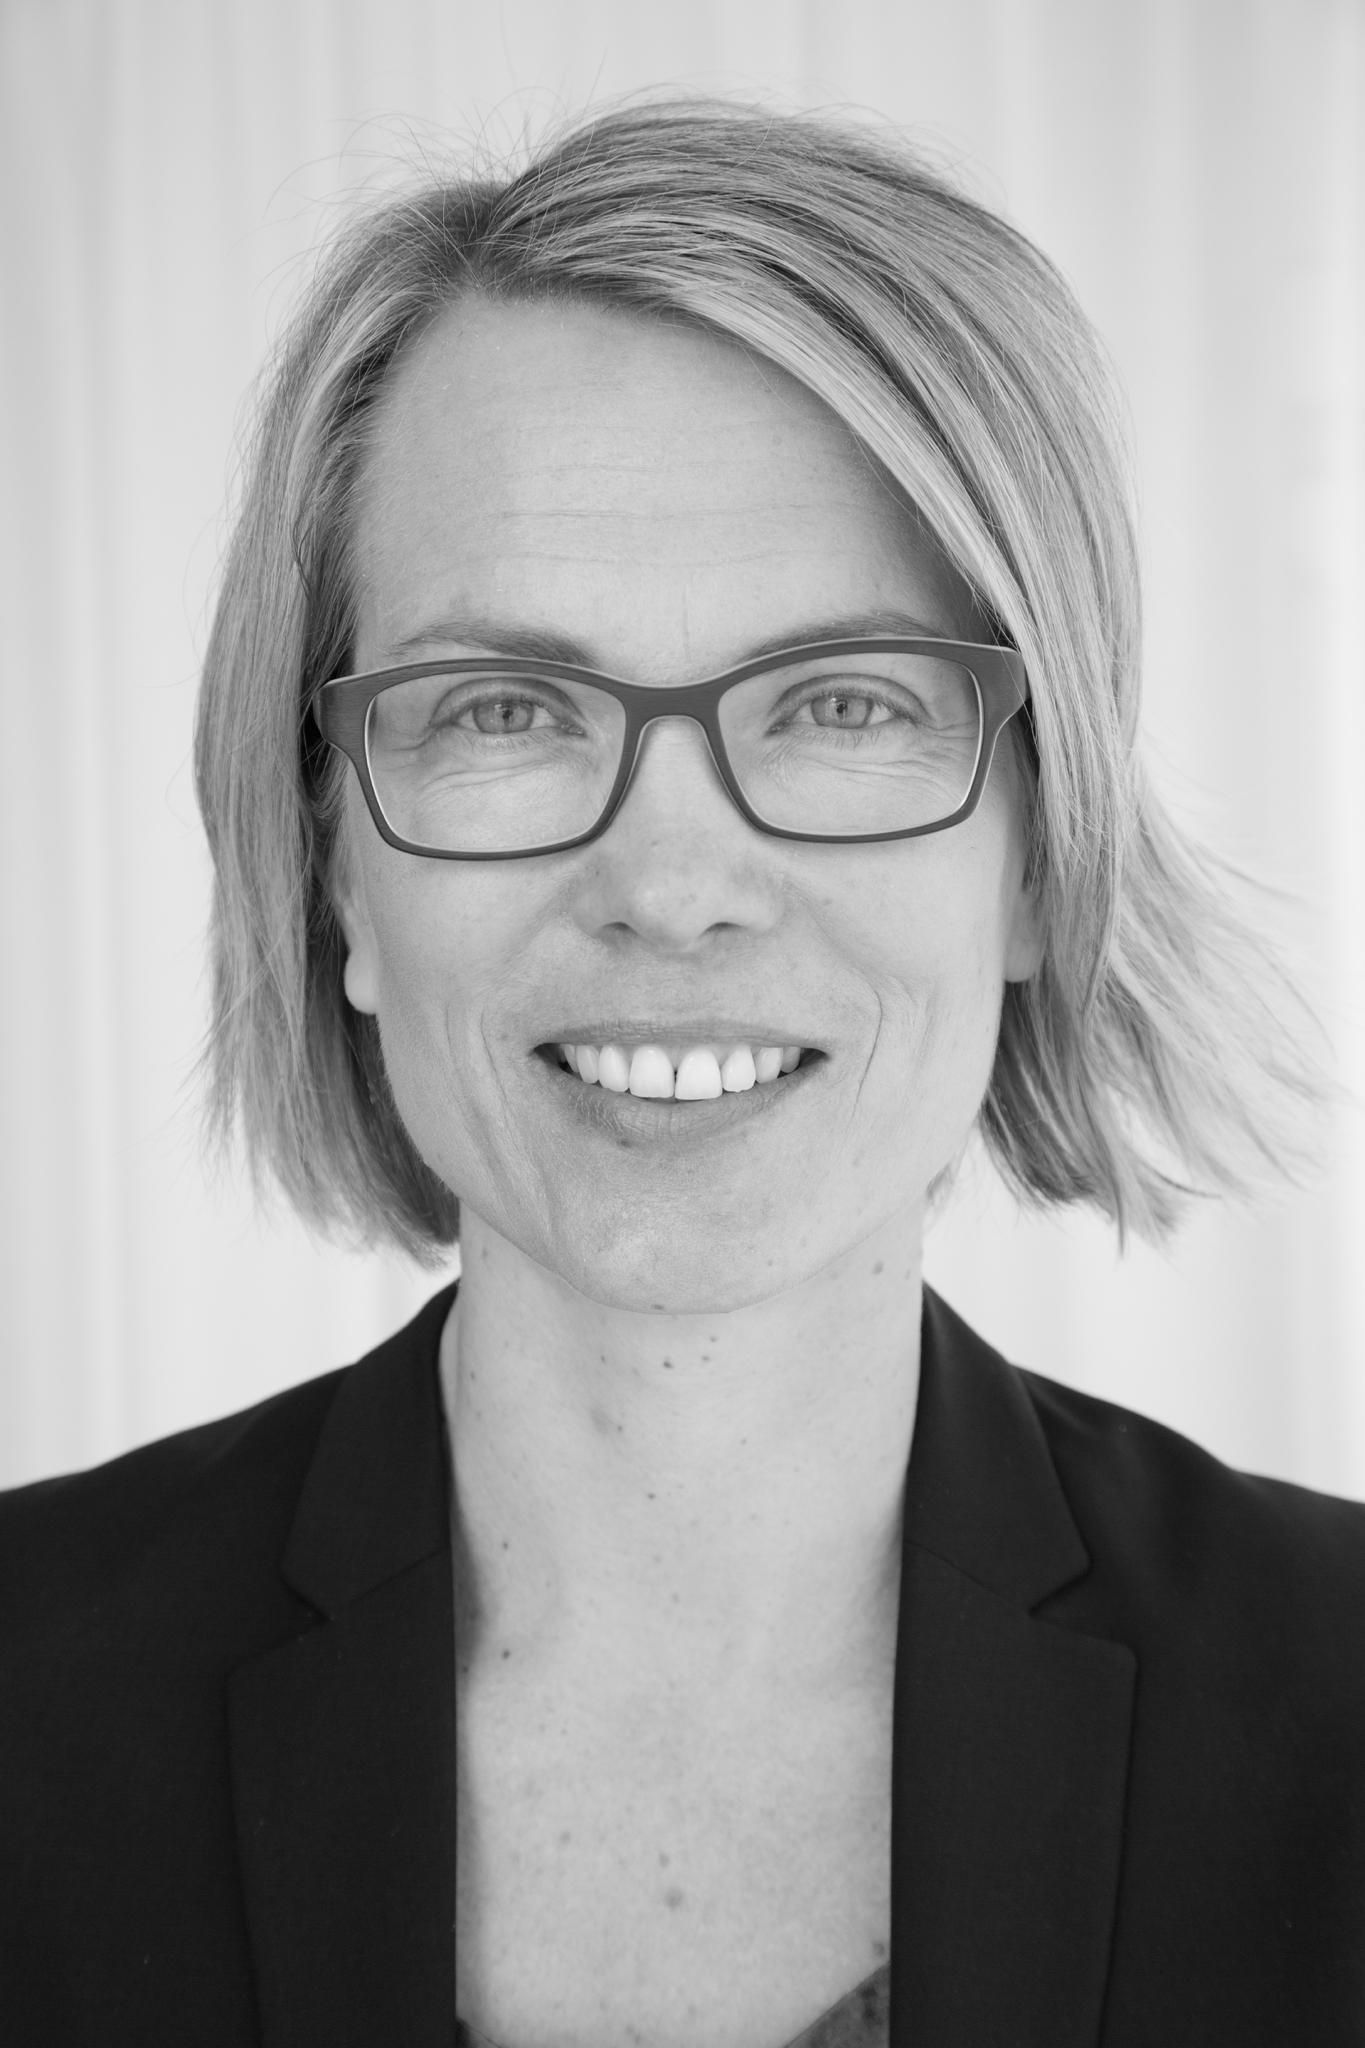 Daniela Johansson